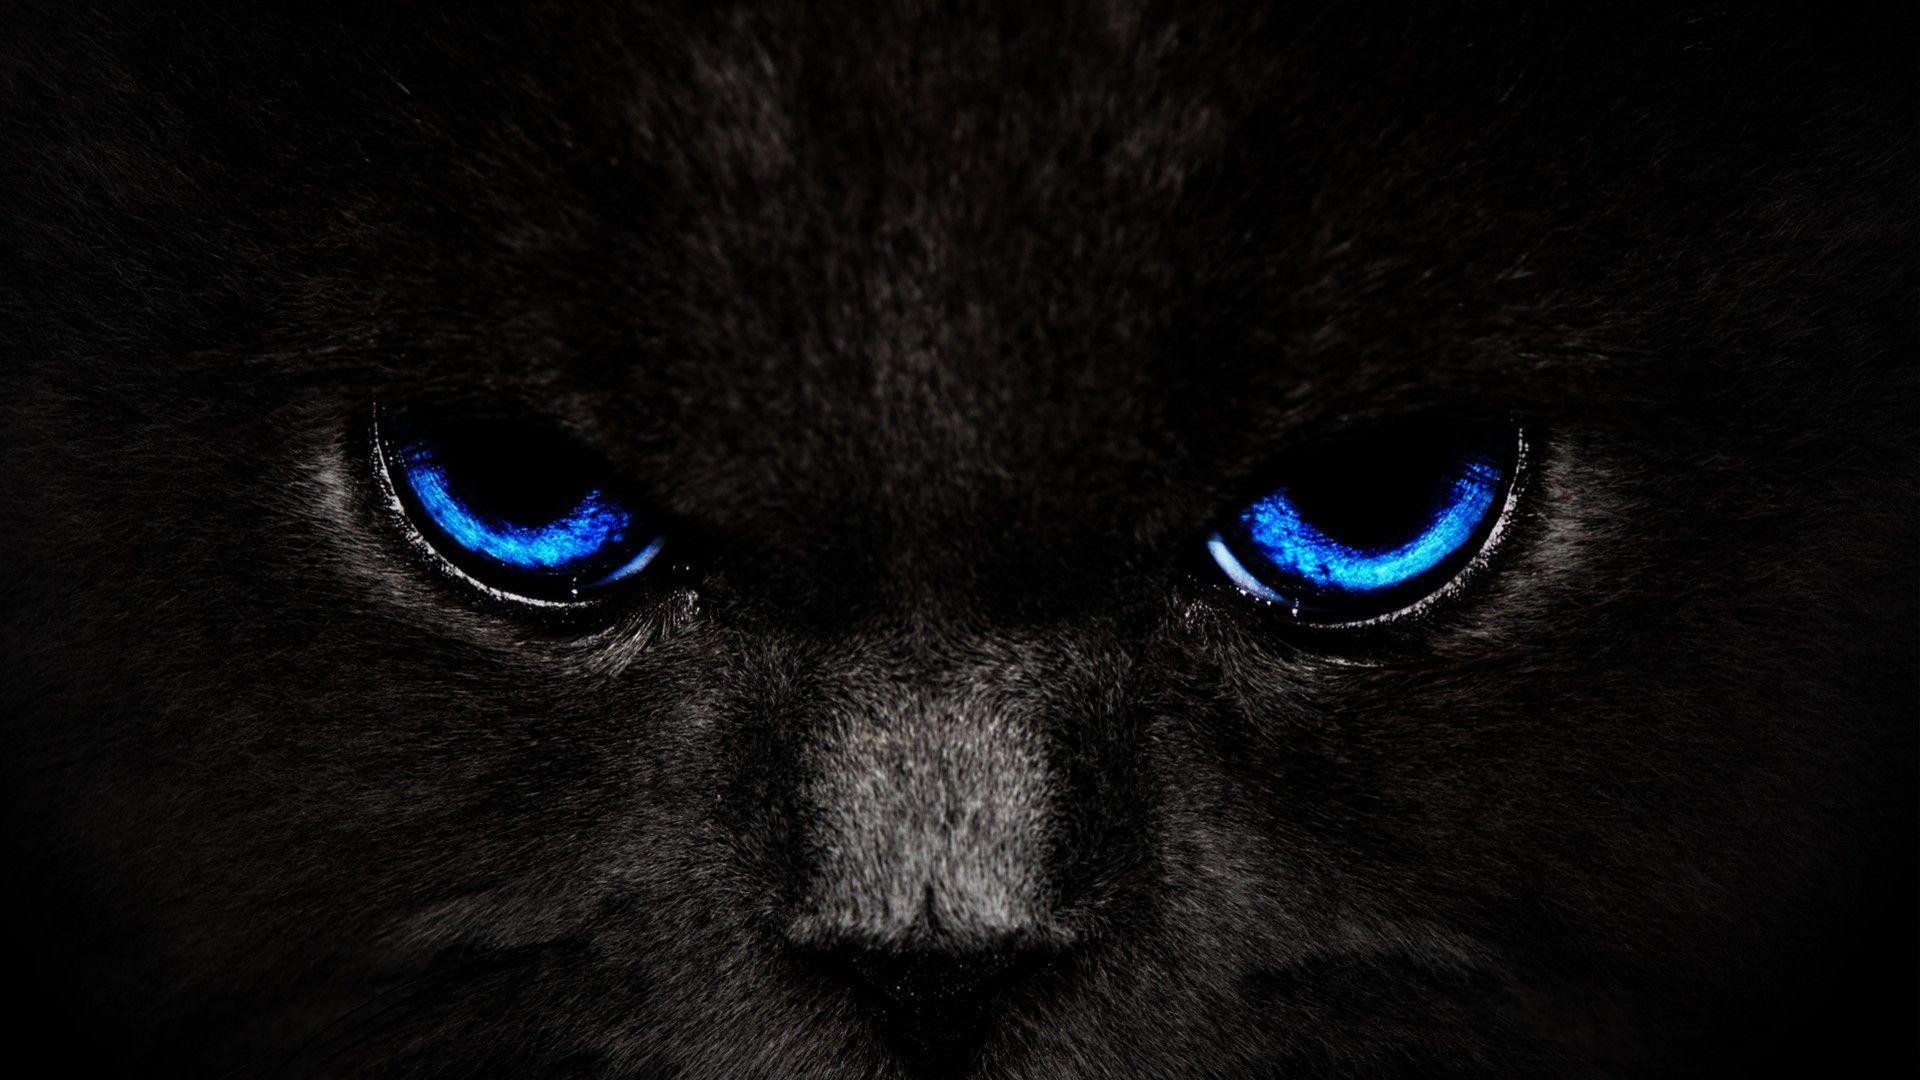 Beautiful Blue Eyes Cats Wallpapers HD For Desktop - HD Wallpapers ...